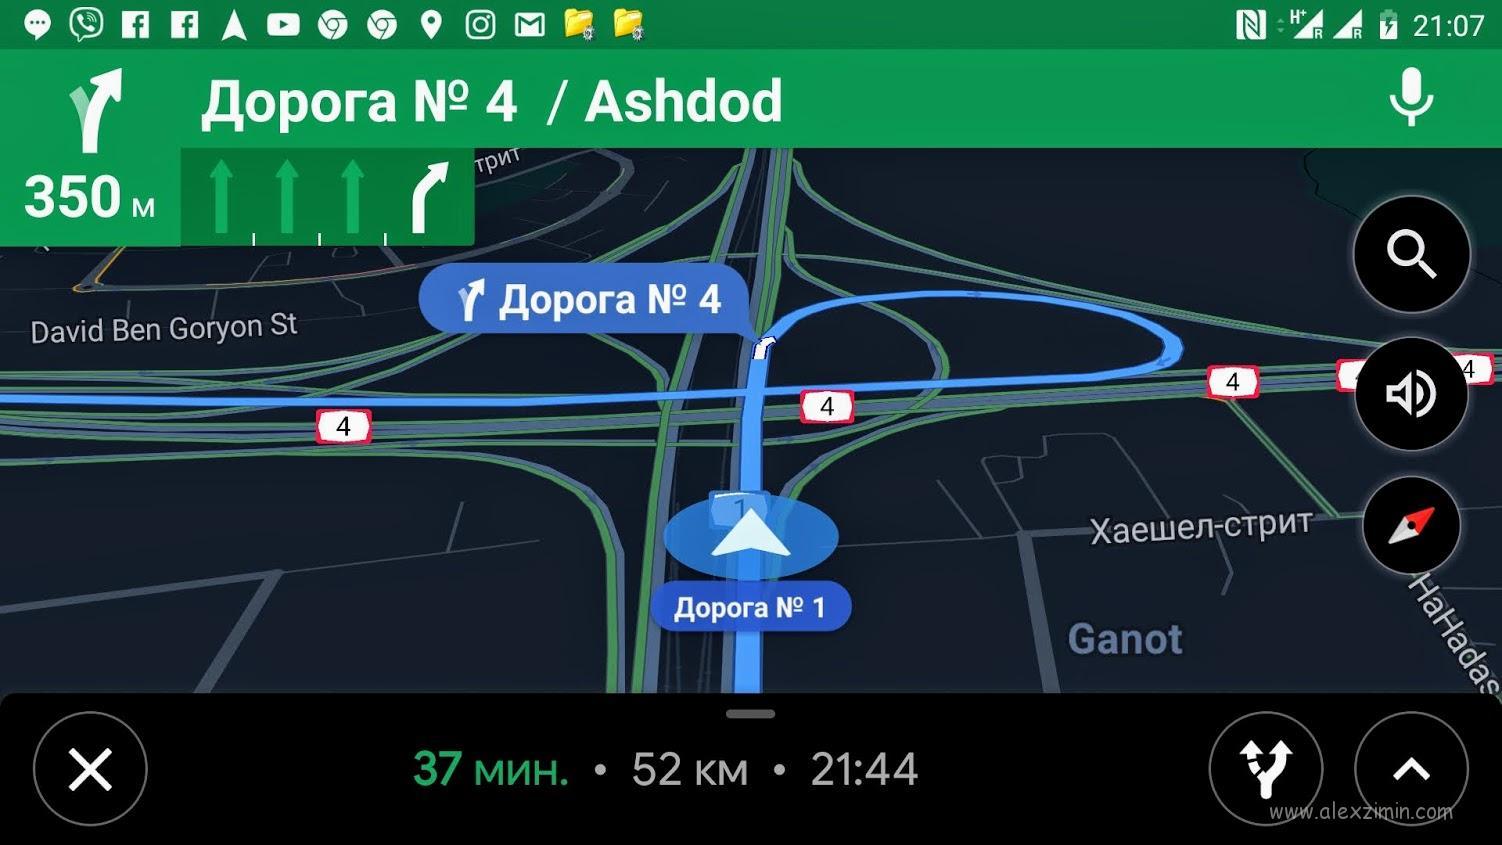 Навгационная программа Google maps в Израиле